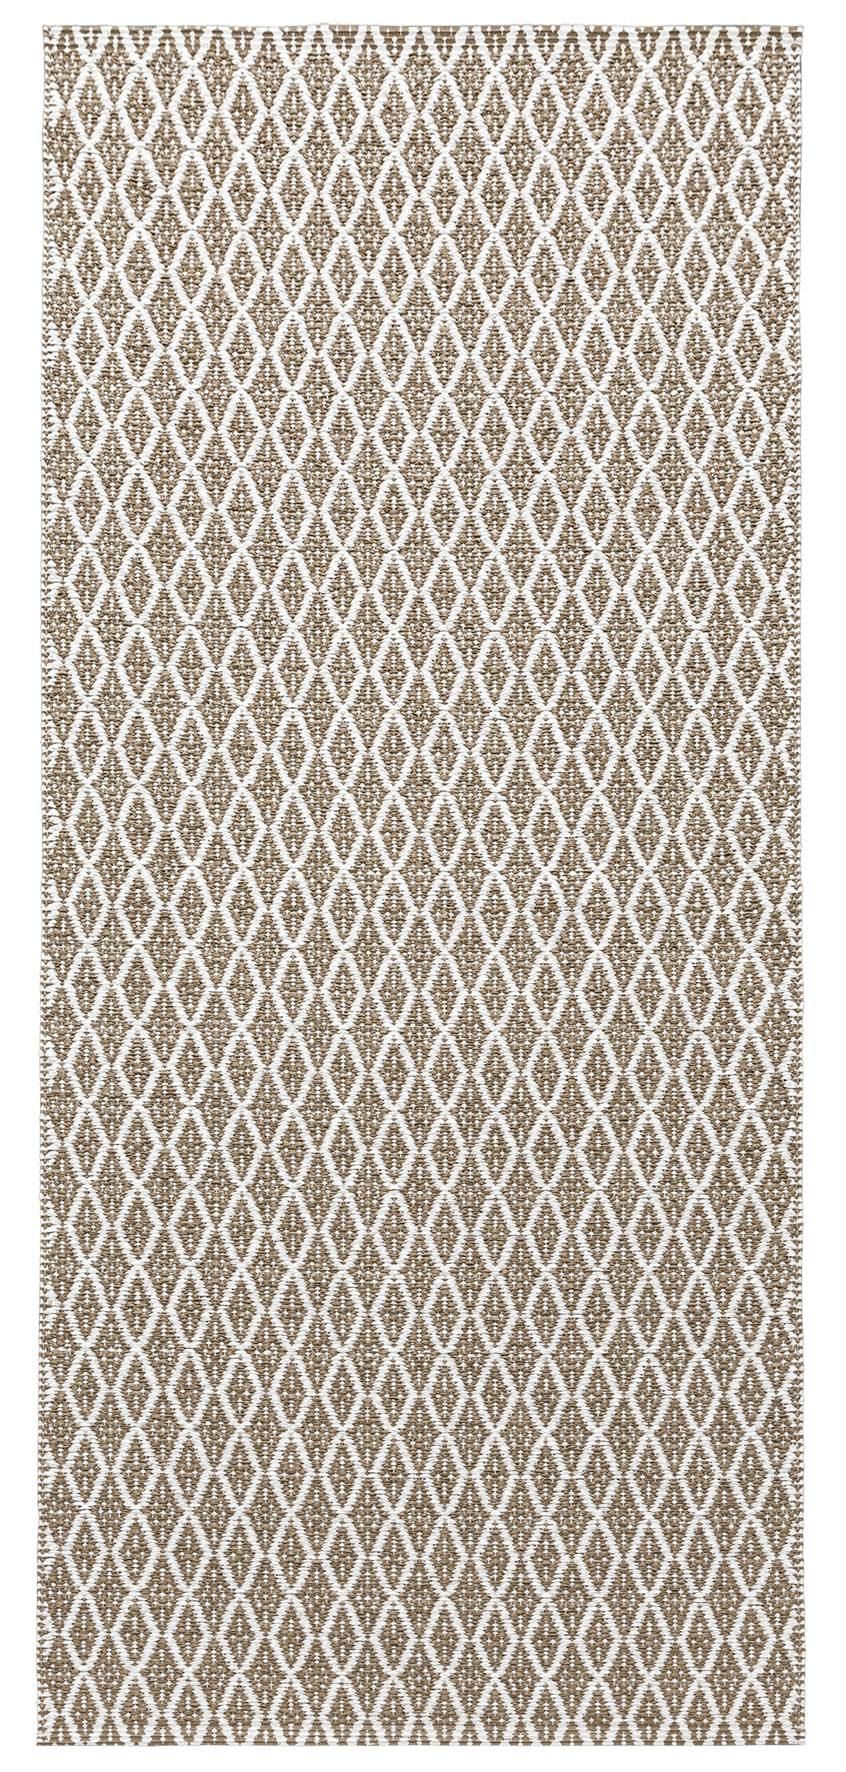 Horredsmattan - Plastmatta Eye 70 x 150 cm - Natur